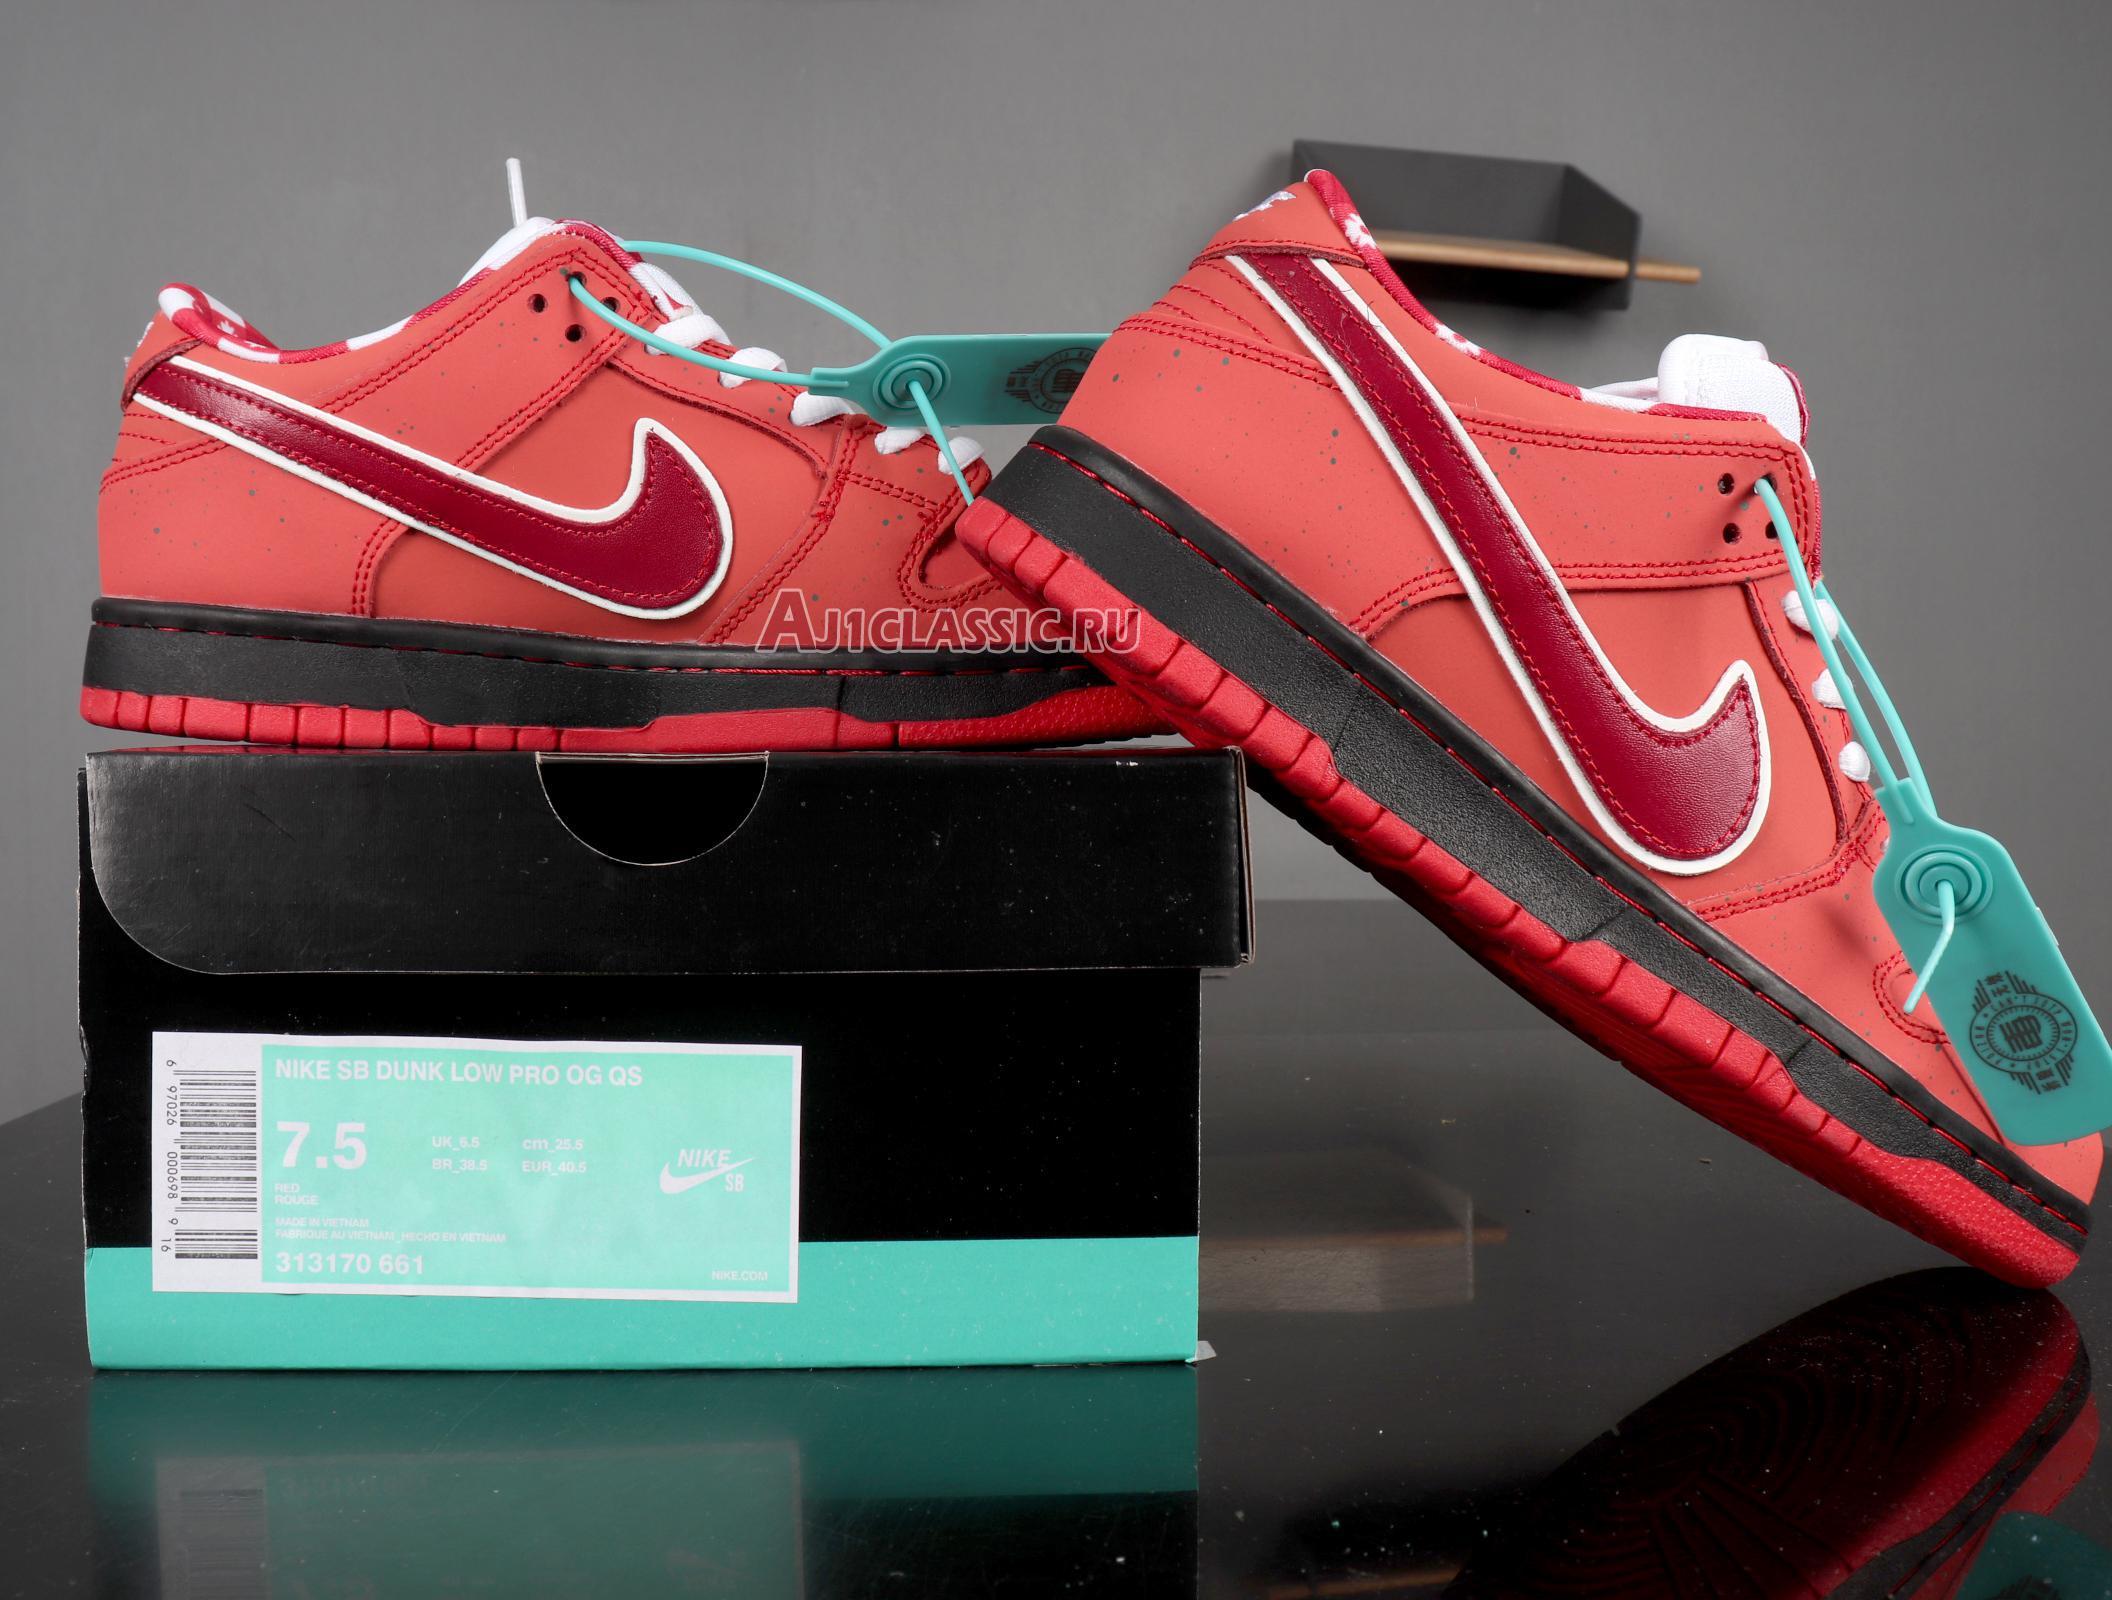 "Nike SB Dunk Low ""Lobster"" 313170-661"